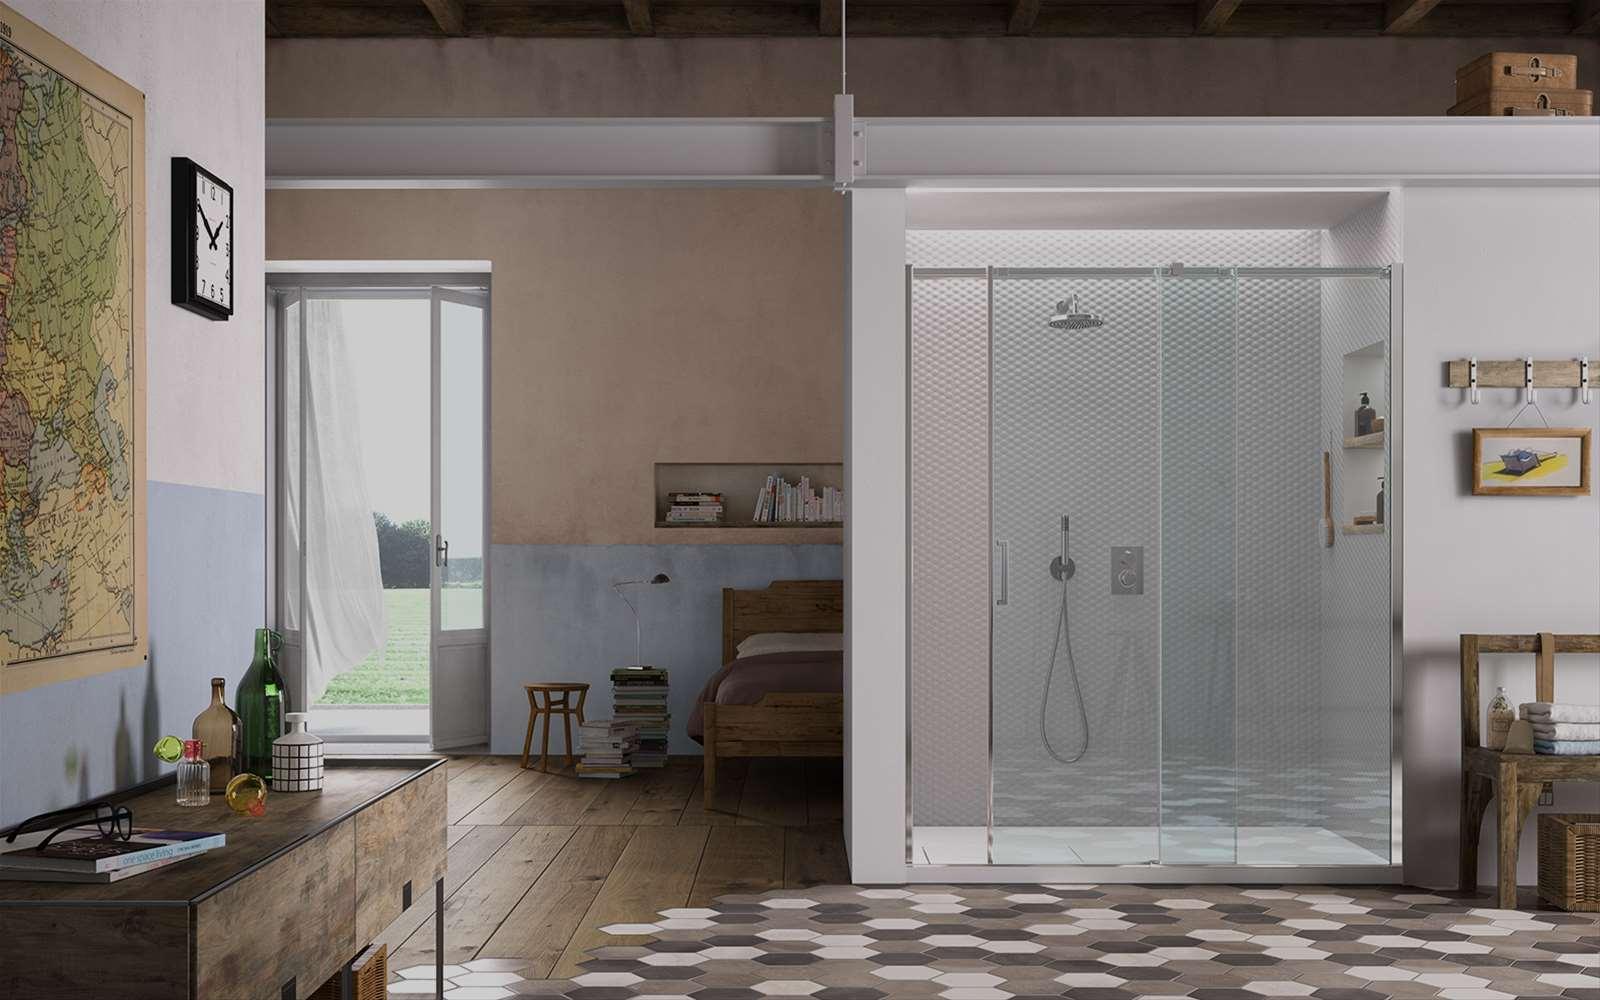 Gliss | Cabina de ducha corredera dotada de patines flotantes